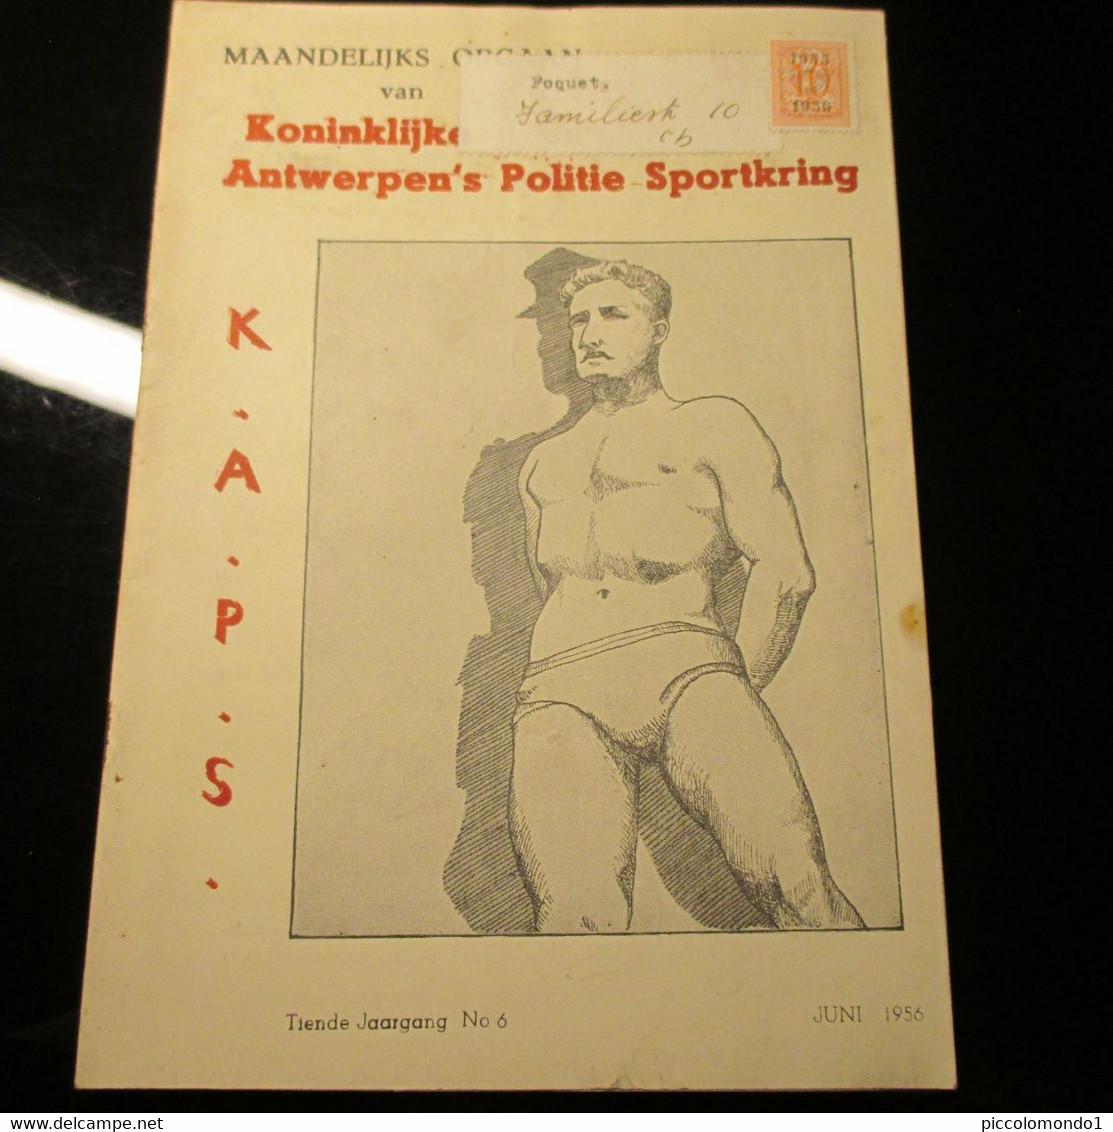 Antwerpen Politie Sportkring 1956 Groot Antwerpen Compagnie Maritime Congolaise - Practical